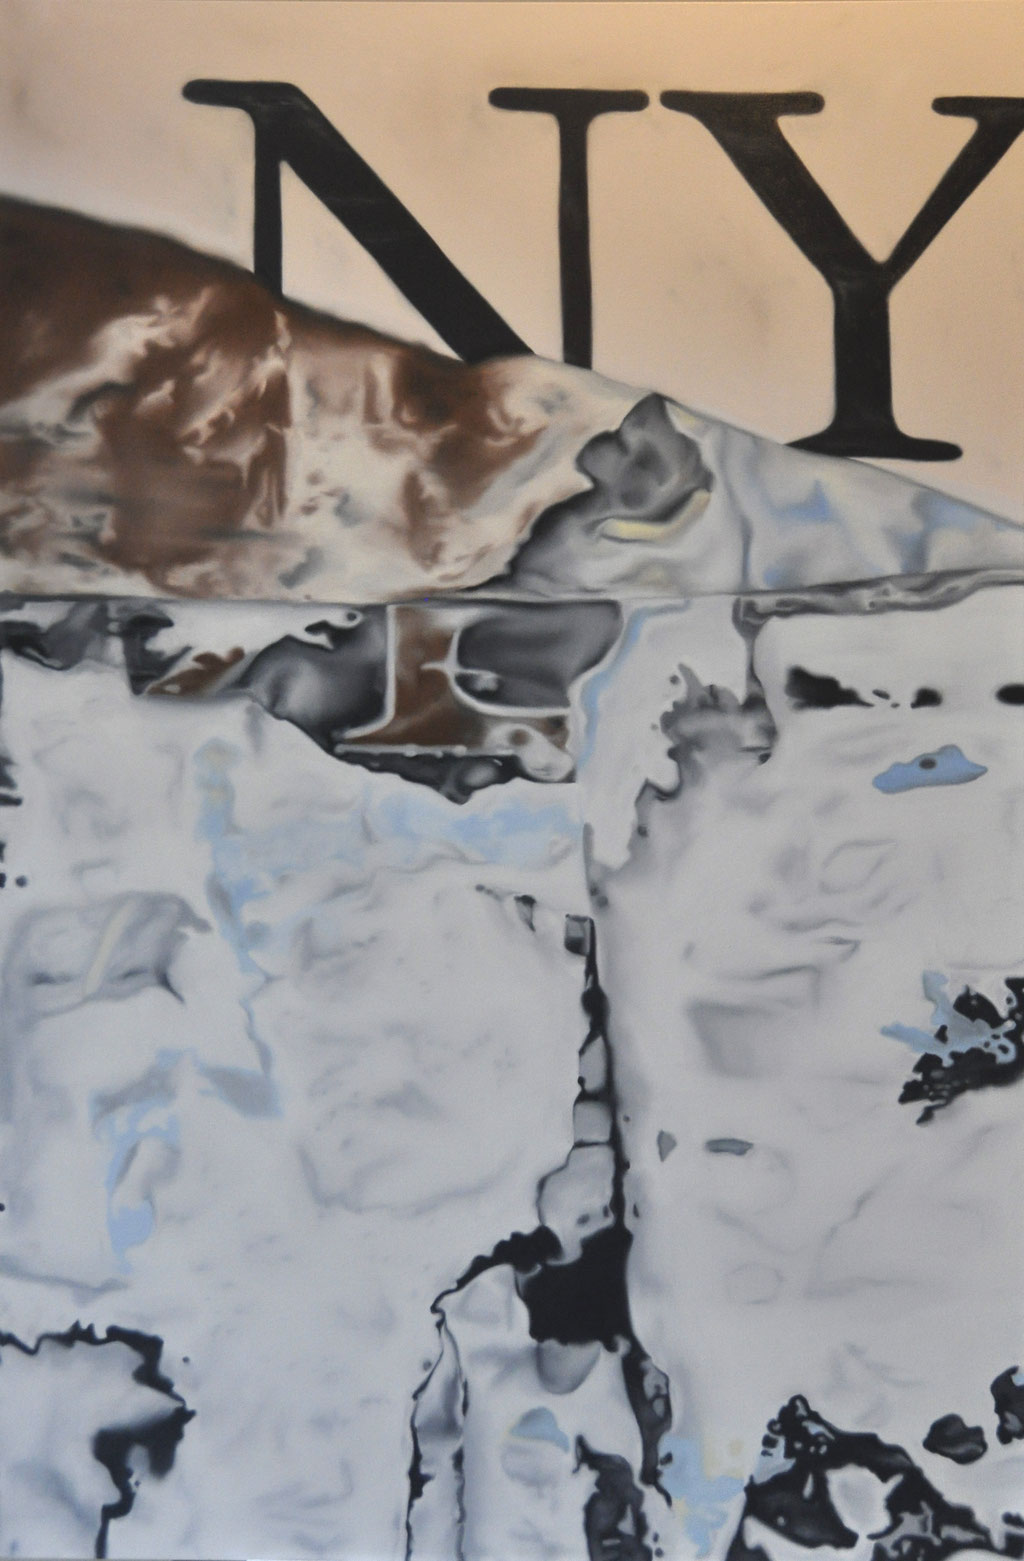 NY, oil on canvas, 120 x 180 cm, 2018